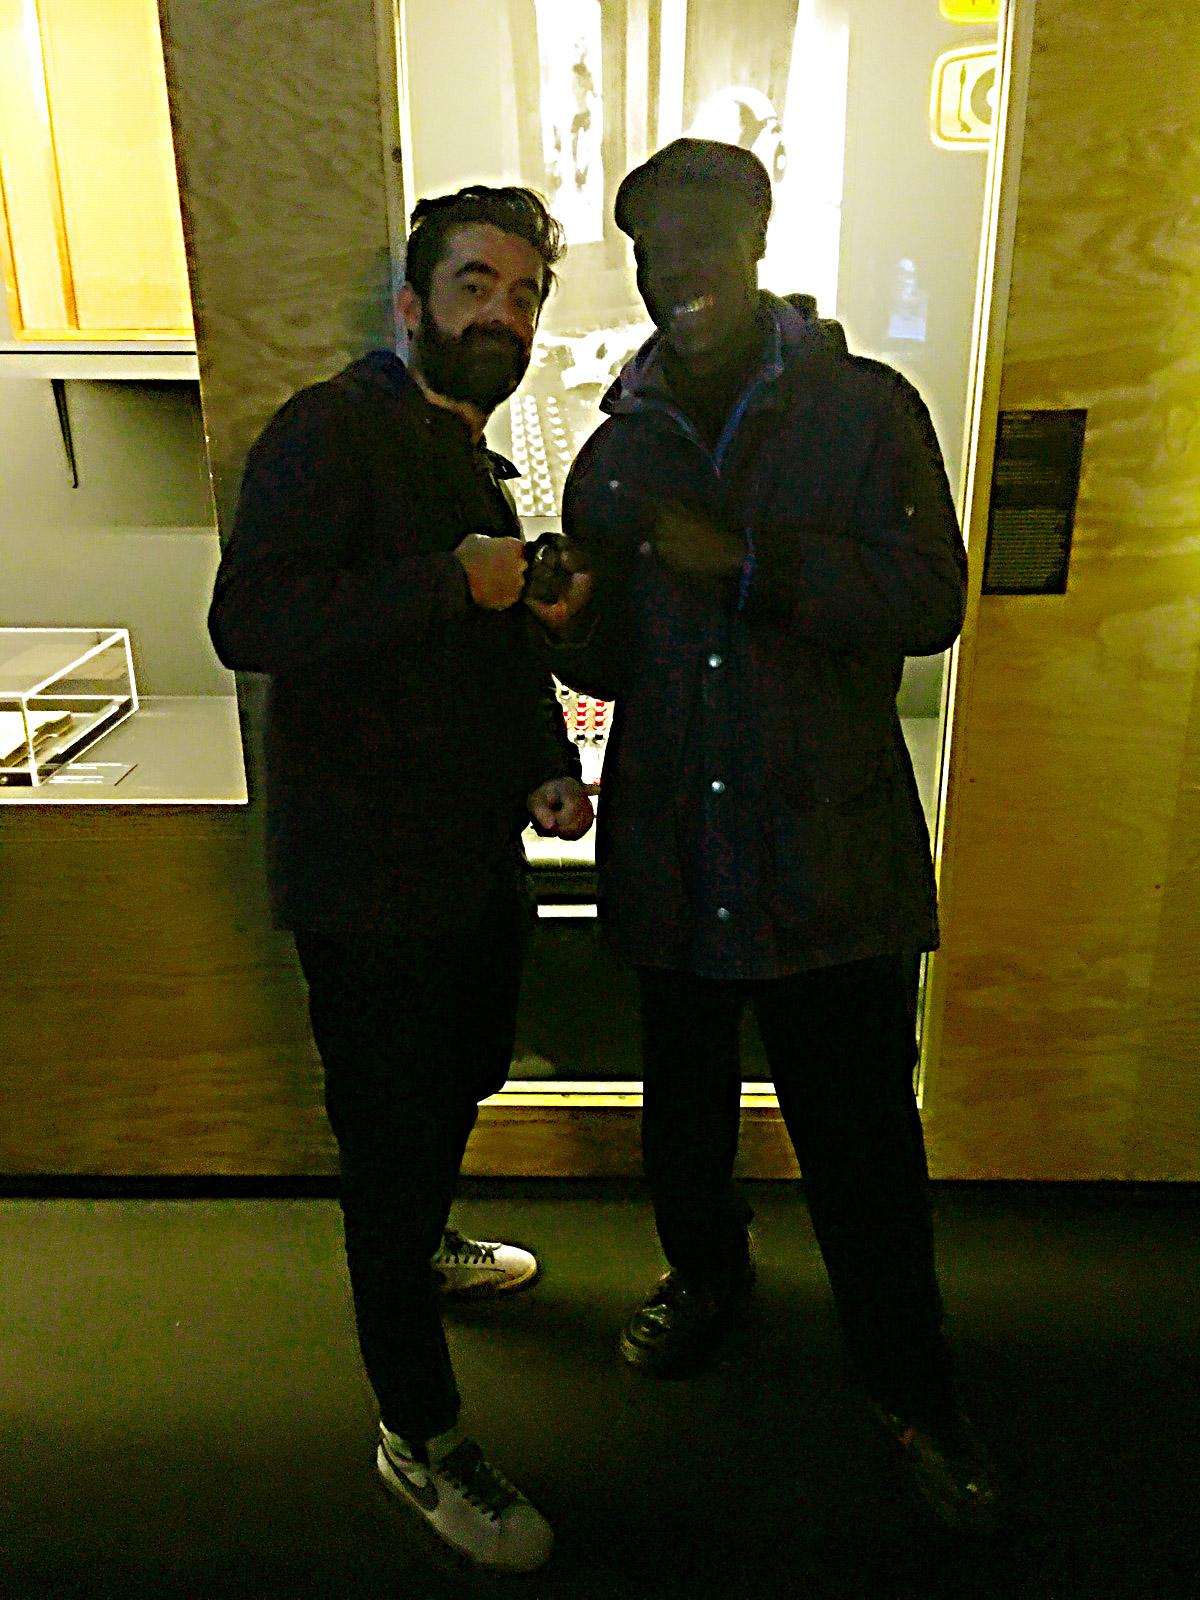 Jamaica Jamaica curator Seb Carayol and Alpha alumni Vin Gordon